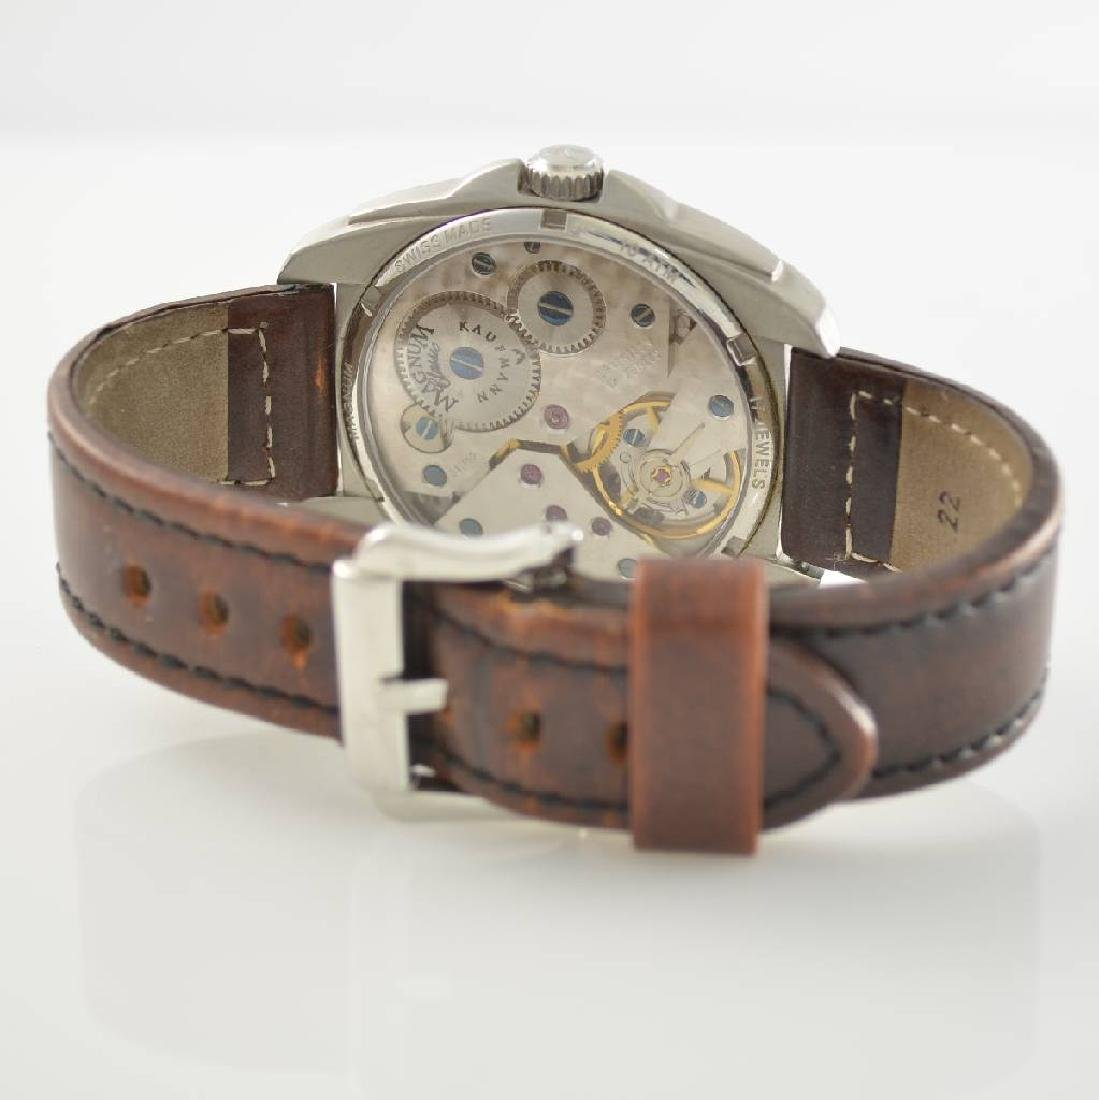 KAUFMANN manual wound gents wristwatch model Magnum - 5